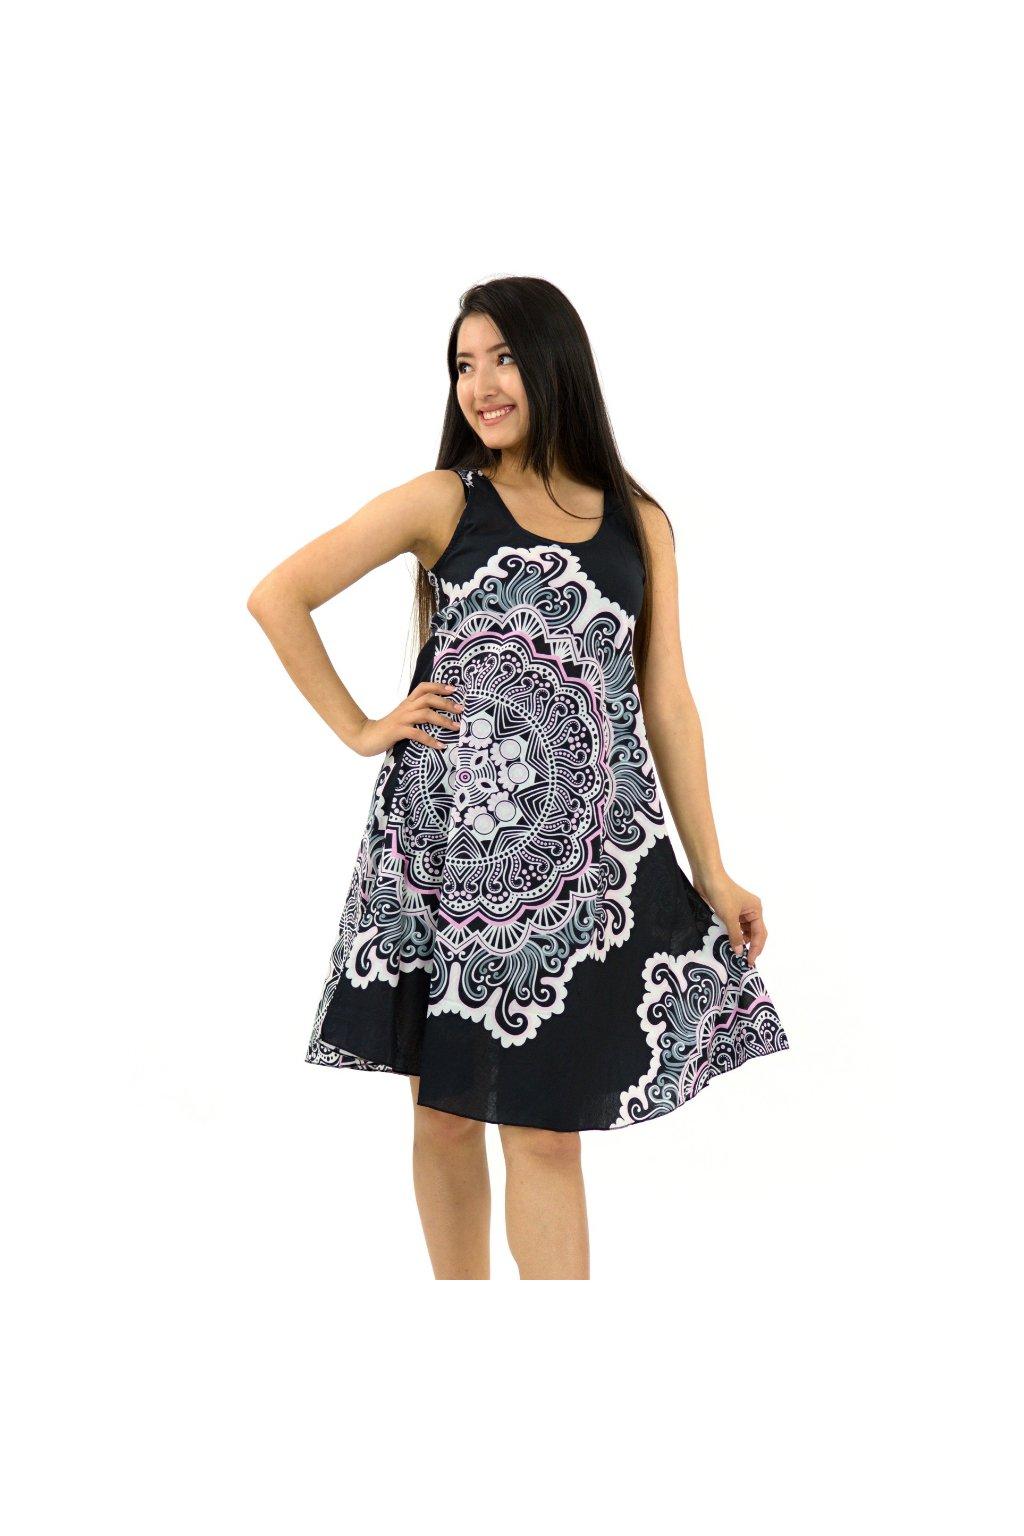 Šaty Ava Sun - černo-bílé